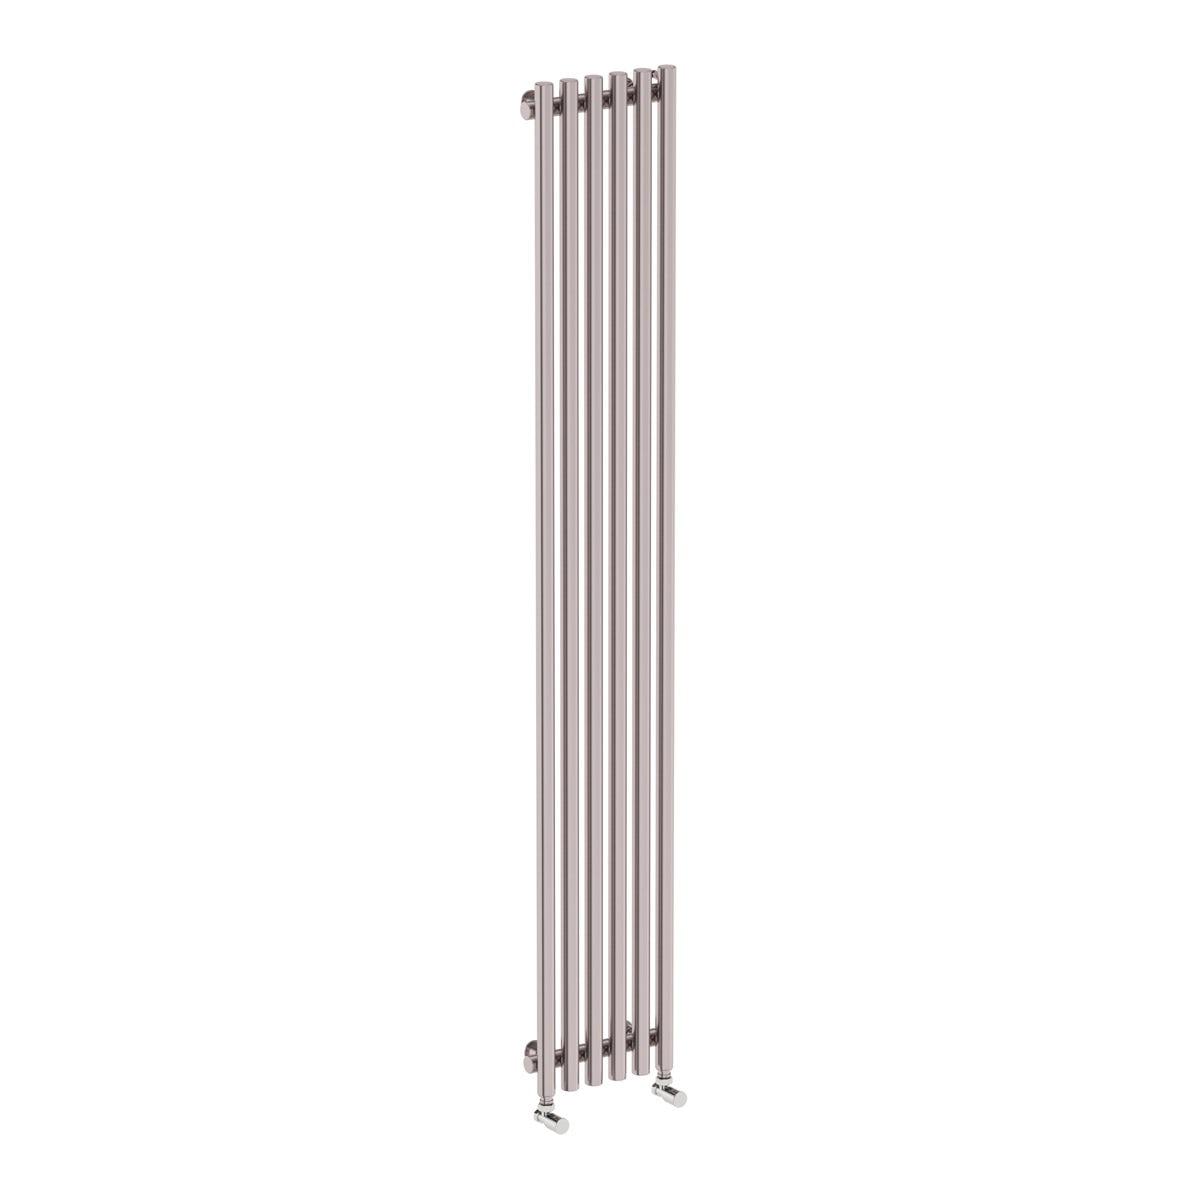 Terma Tune matt nickel single vertical radiator 1800 x 290